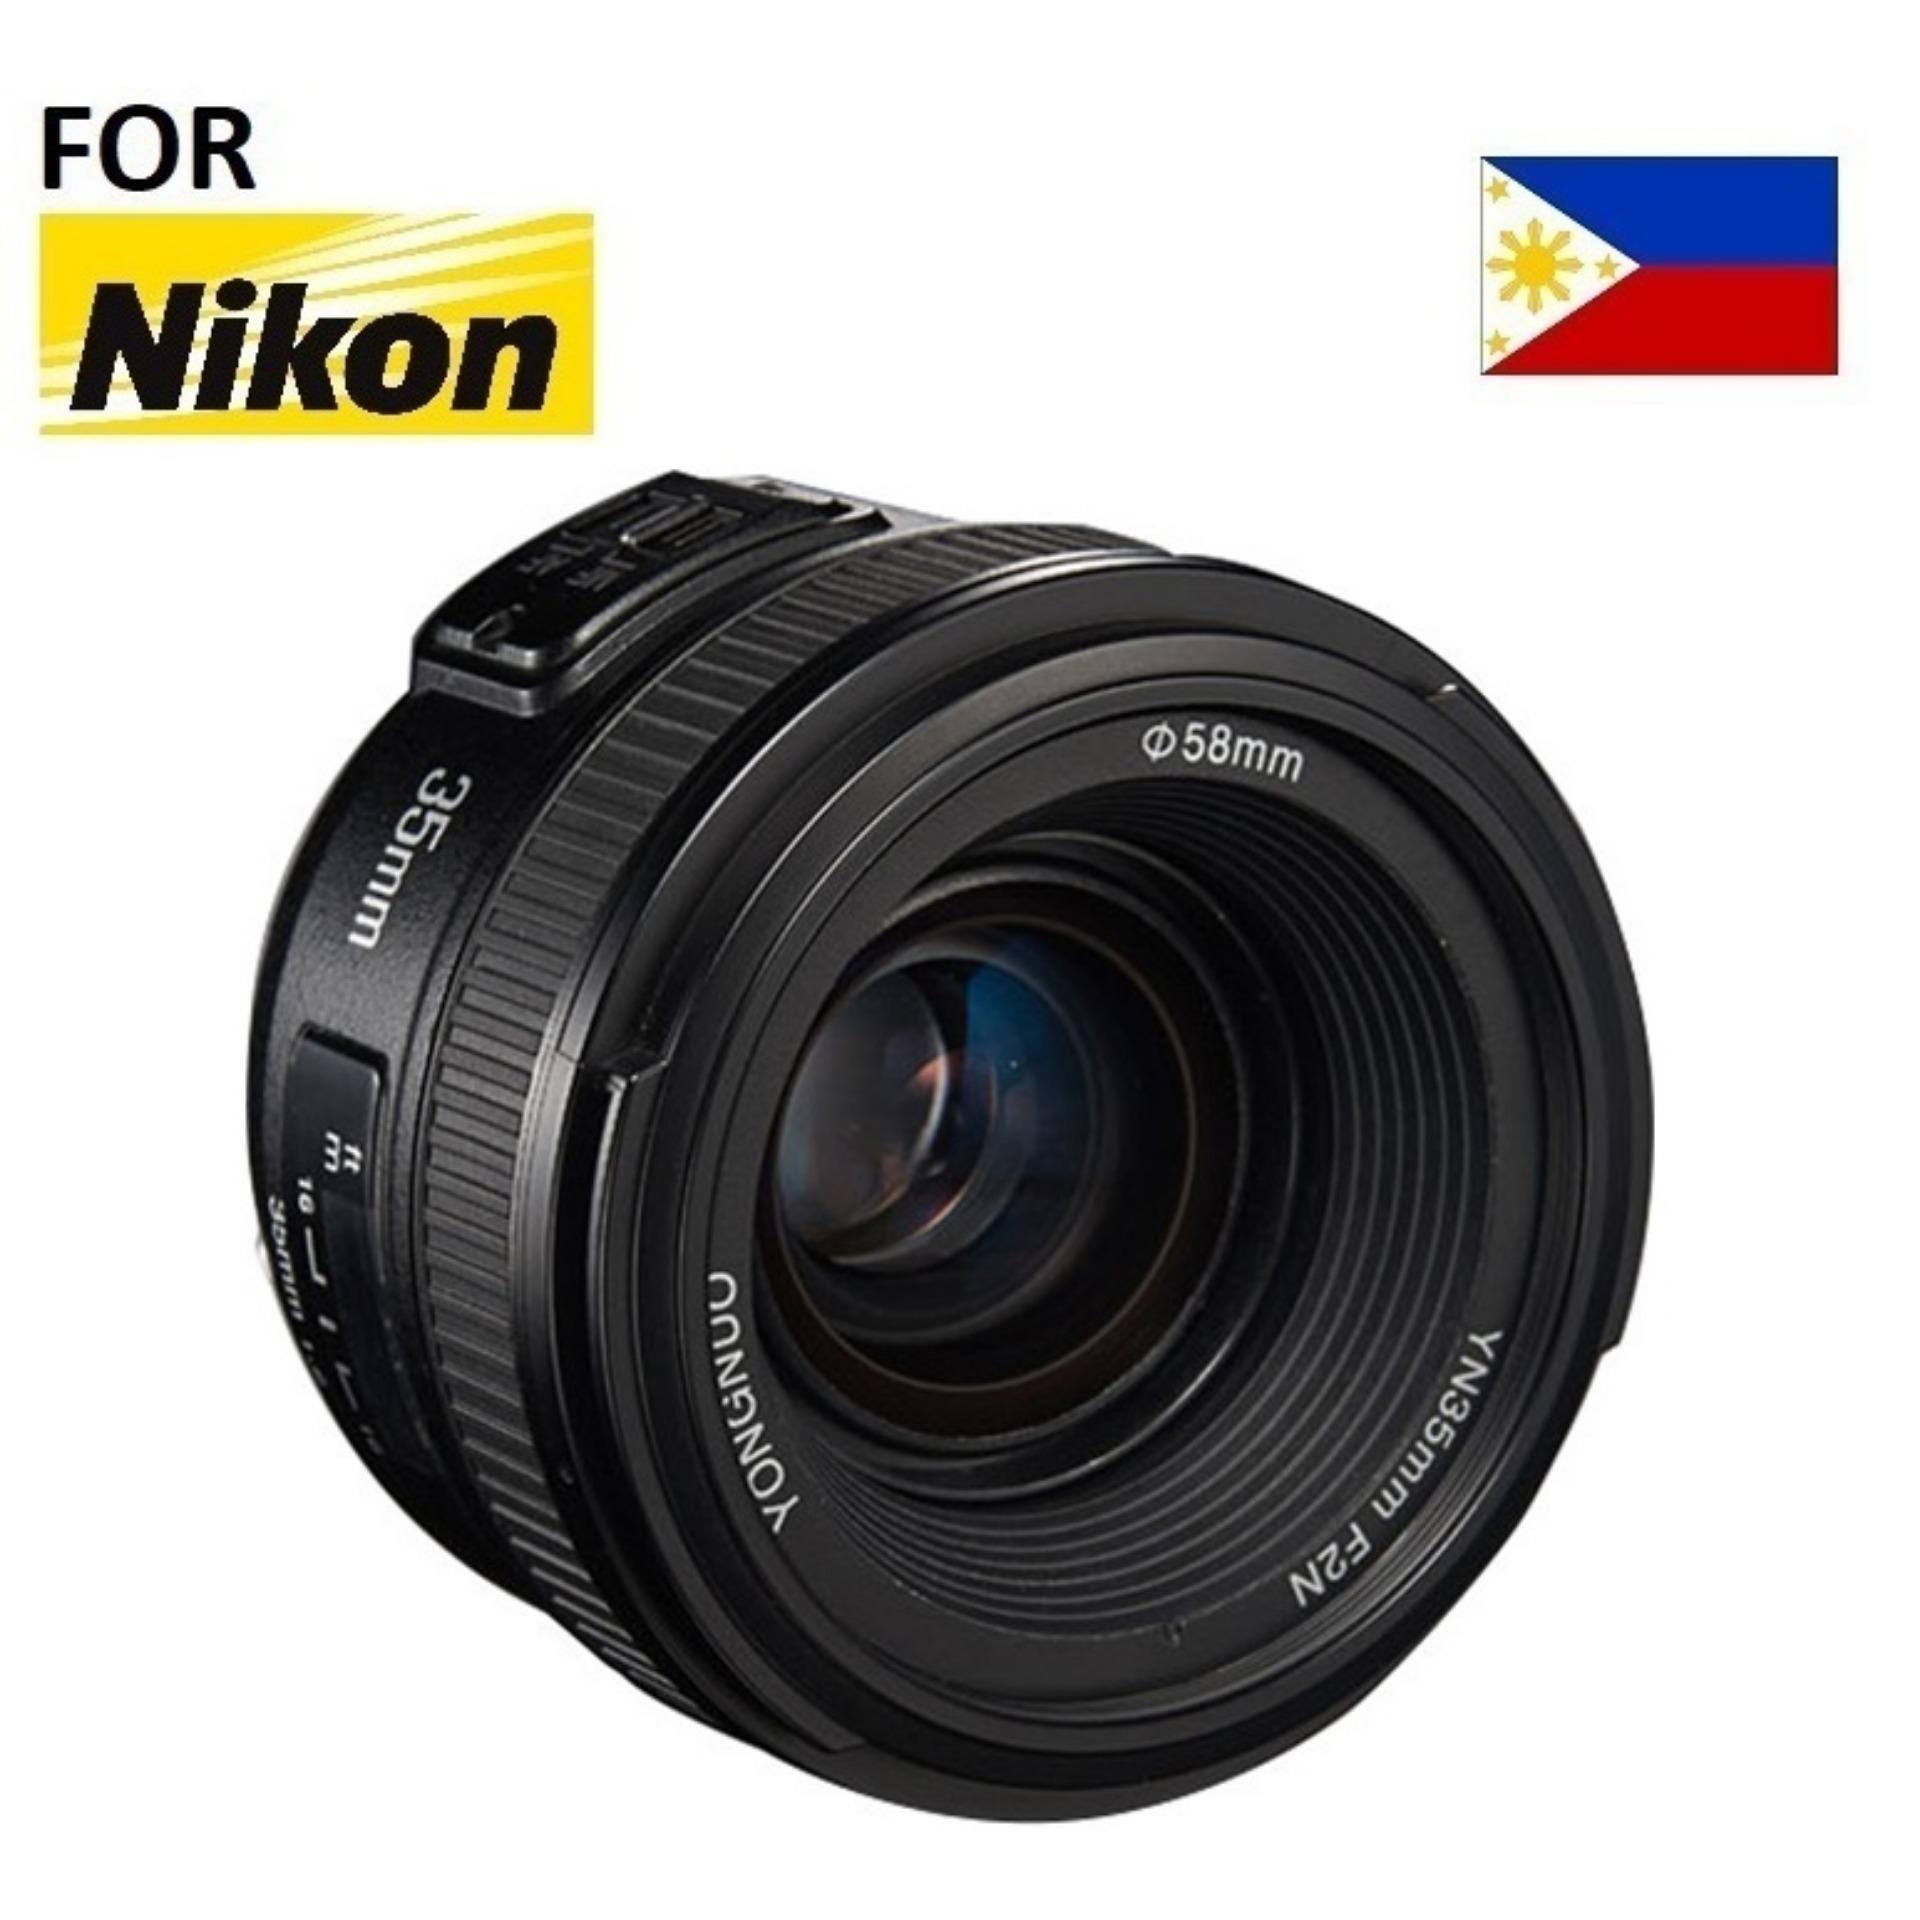 Buy Sell Cheapest Ris A 35mm Best Quality Product Deals Fujifilm X T100 Body Xf35mm F2 Gold Kamera Mirrorless Yongnuo Yn F 2 Lens For Nikon